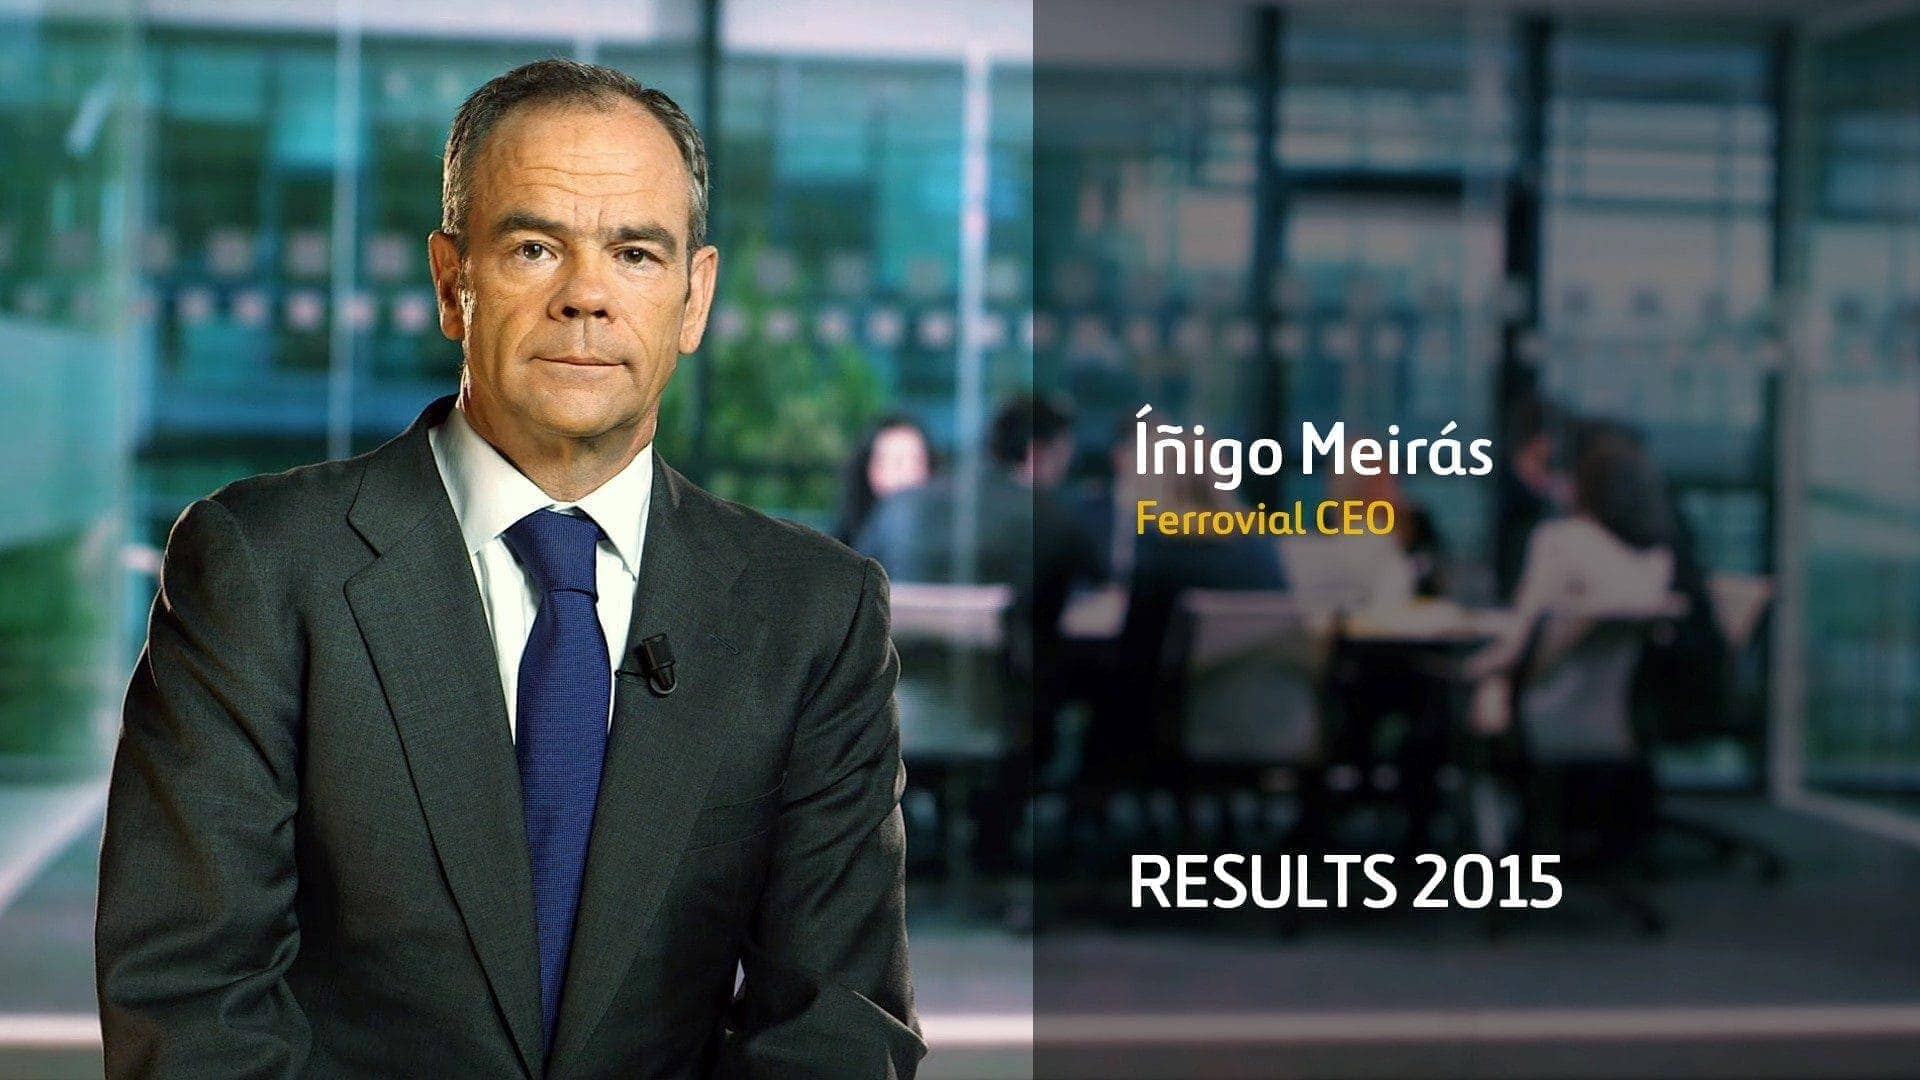 iñigo video ferrovial CEO results 2015